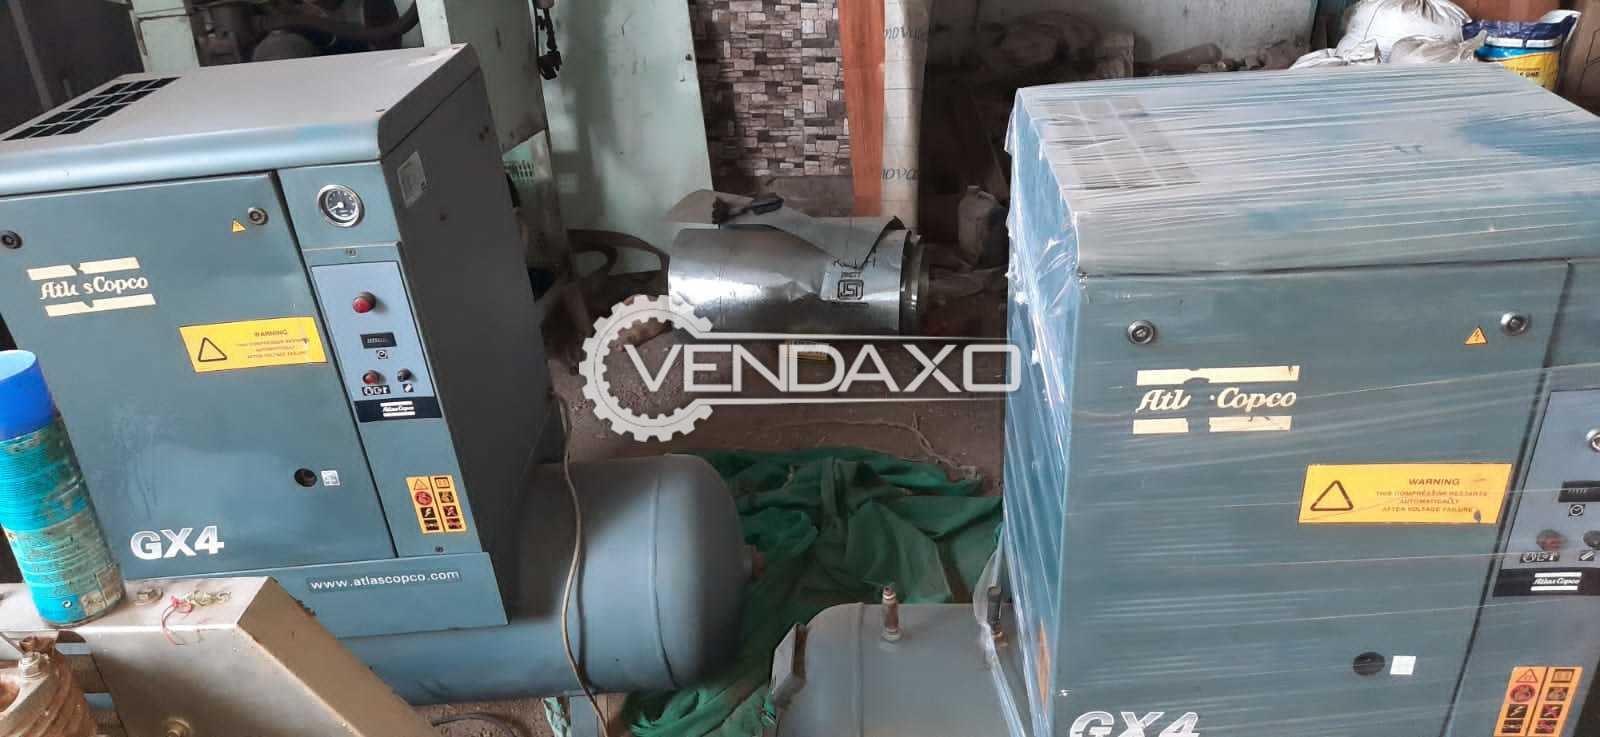 2 Set of Atlas Copco GX4P-200 Rotary Screw Air Compressor - 5 HP, 2012 Model